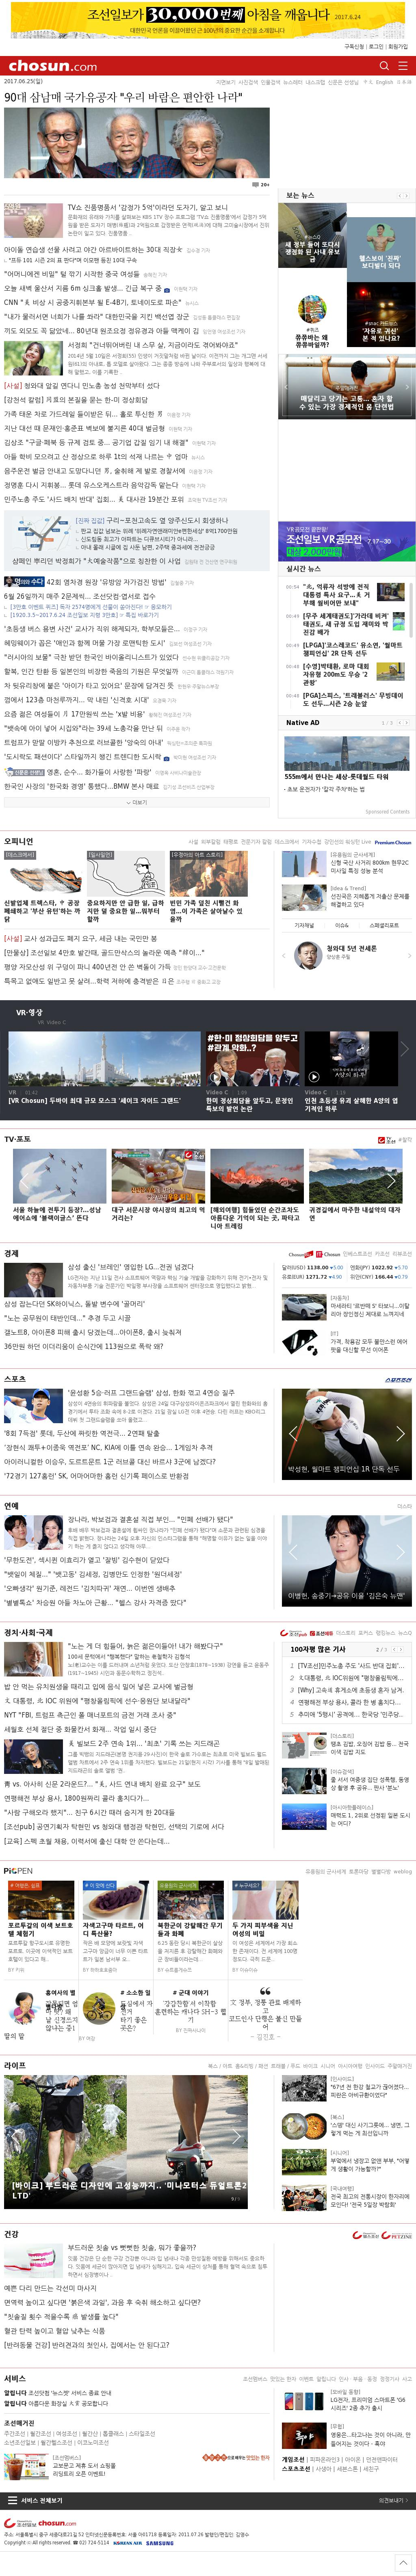 chosun.com at Sunday June 25, 2017, 1:02 a.m. UTC